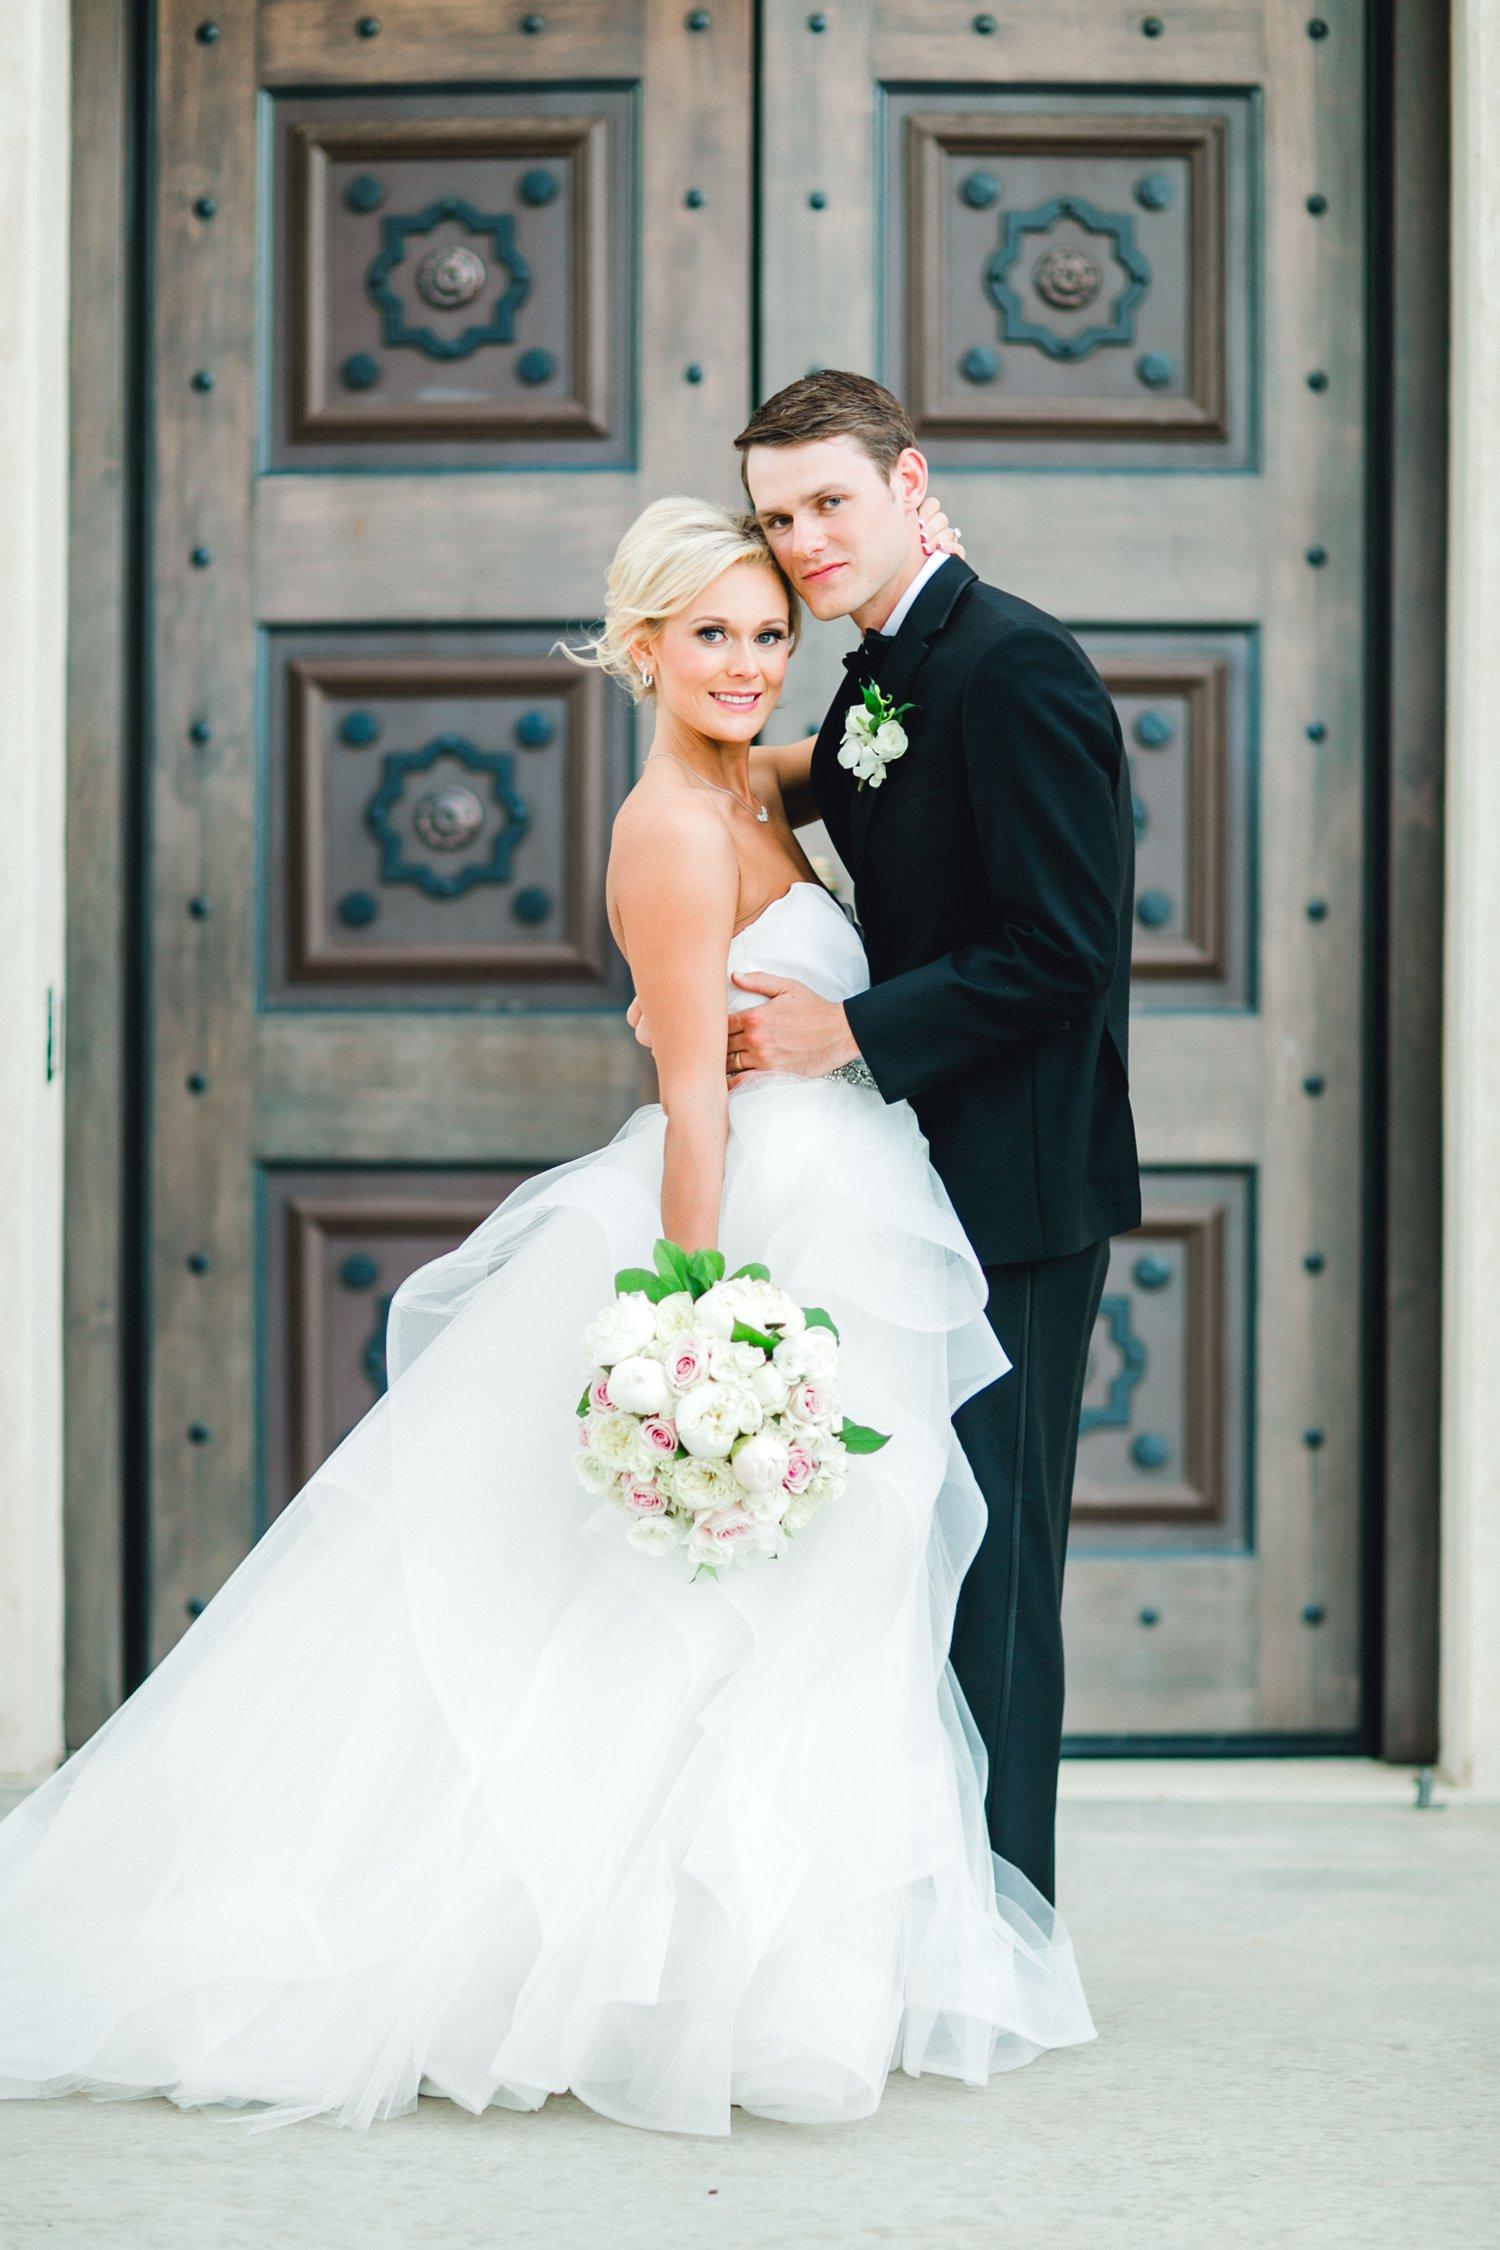 Taylor-and-Brock-Williams-Texas-Tech-University-Merket-Alumni-Center-Lubbock-Photographer-ALLEEJ0154.jpg